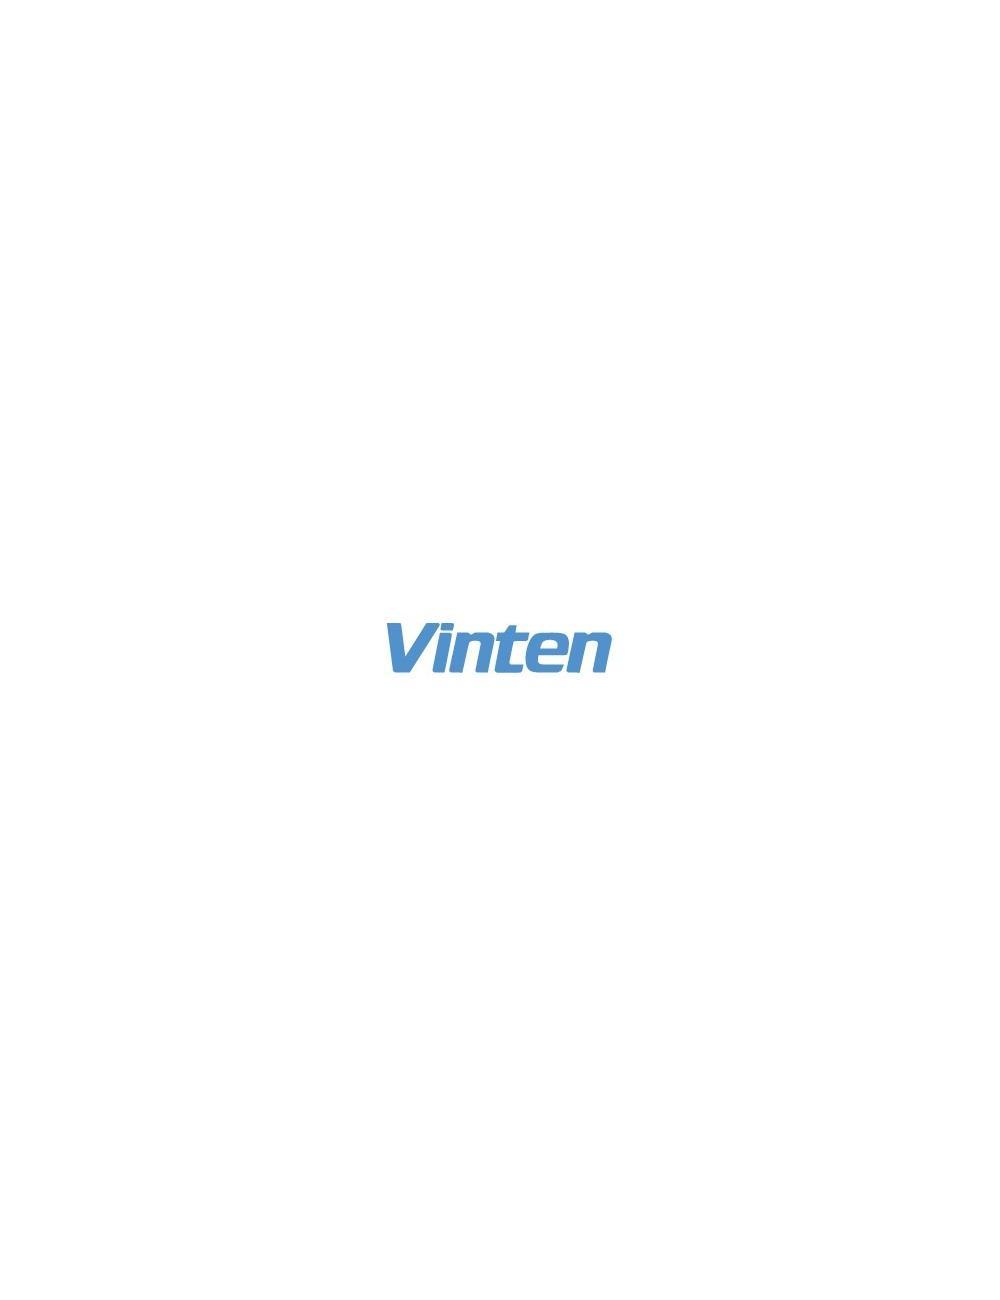 Vinten Hexagon Track termination